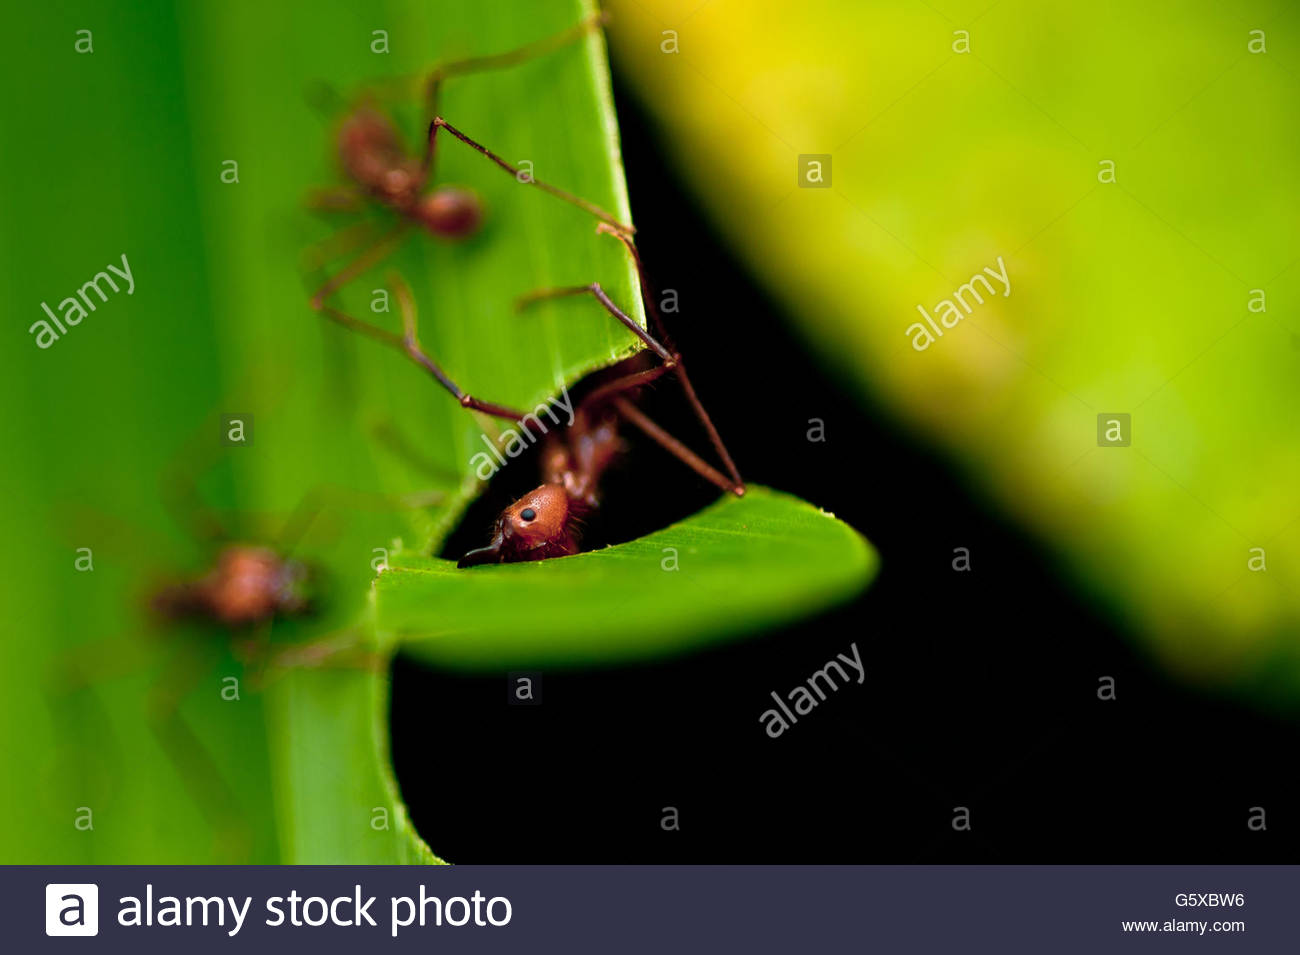 ant, Costa Rica - Stock Image